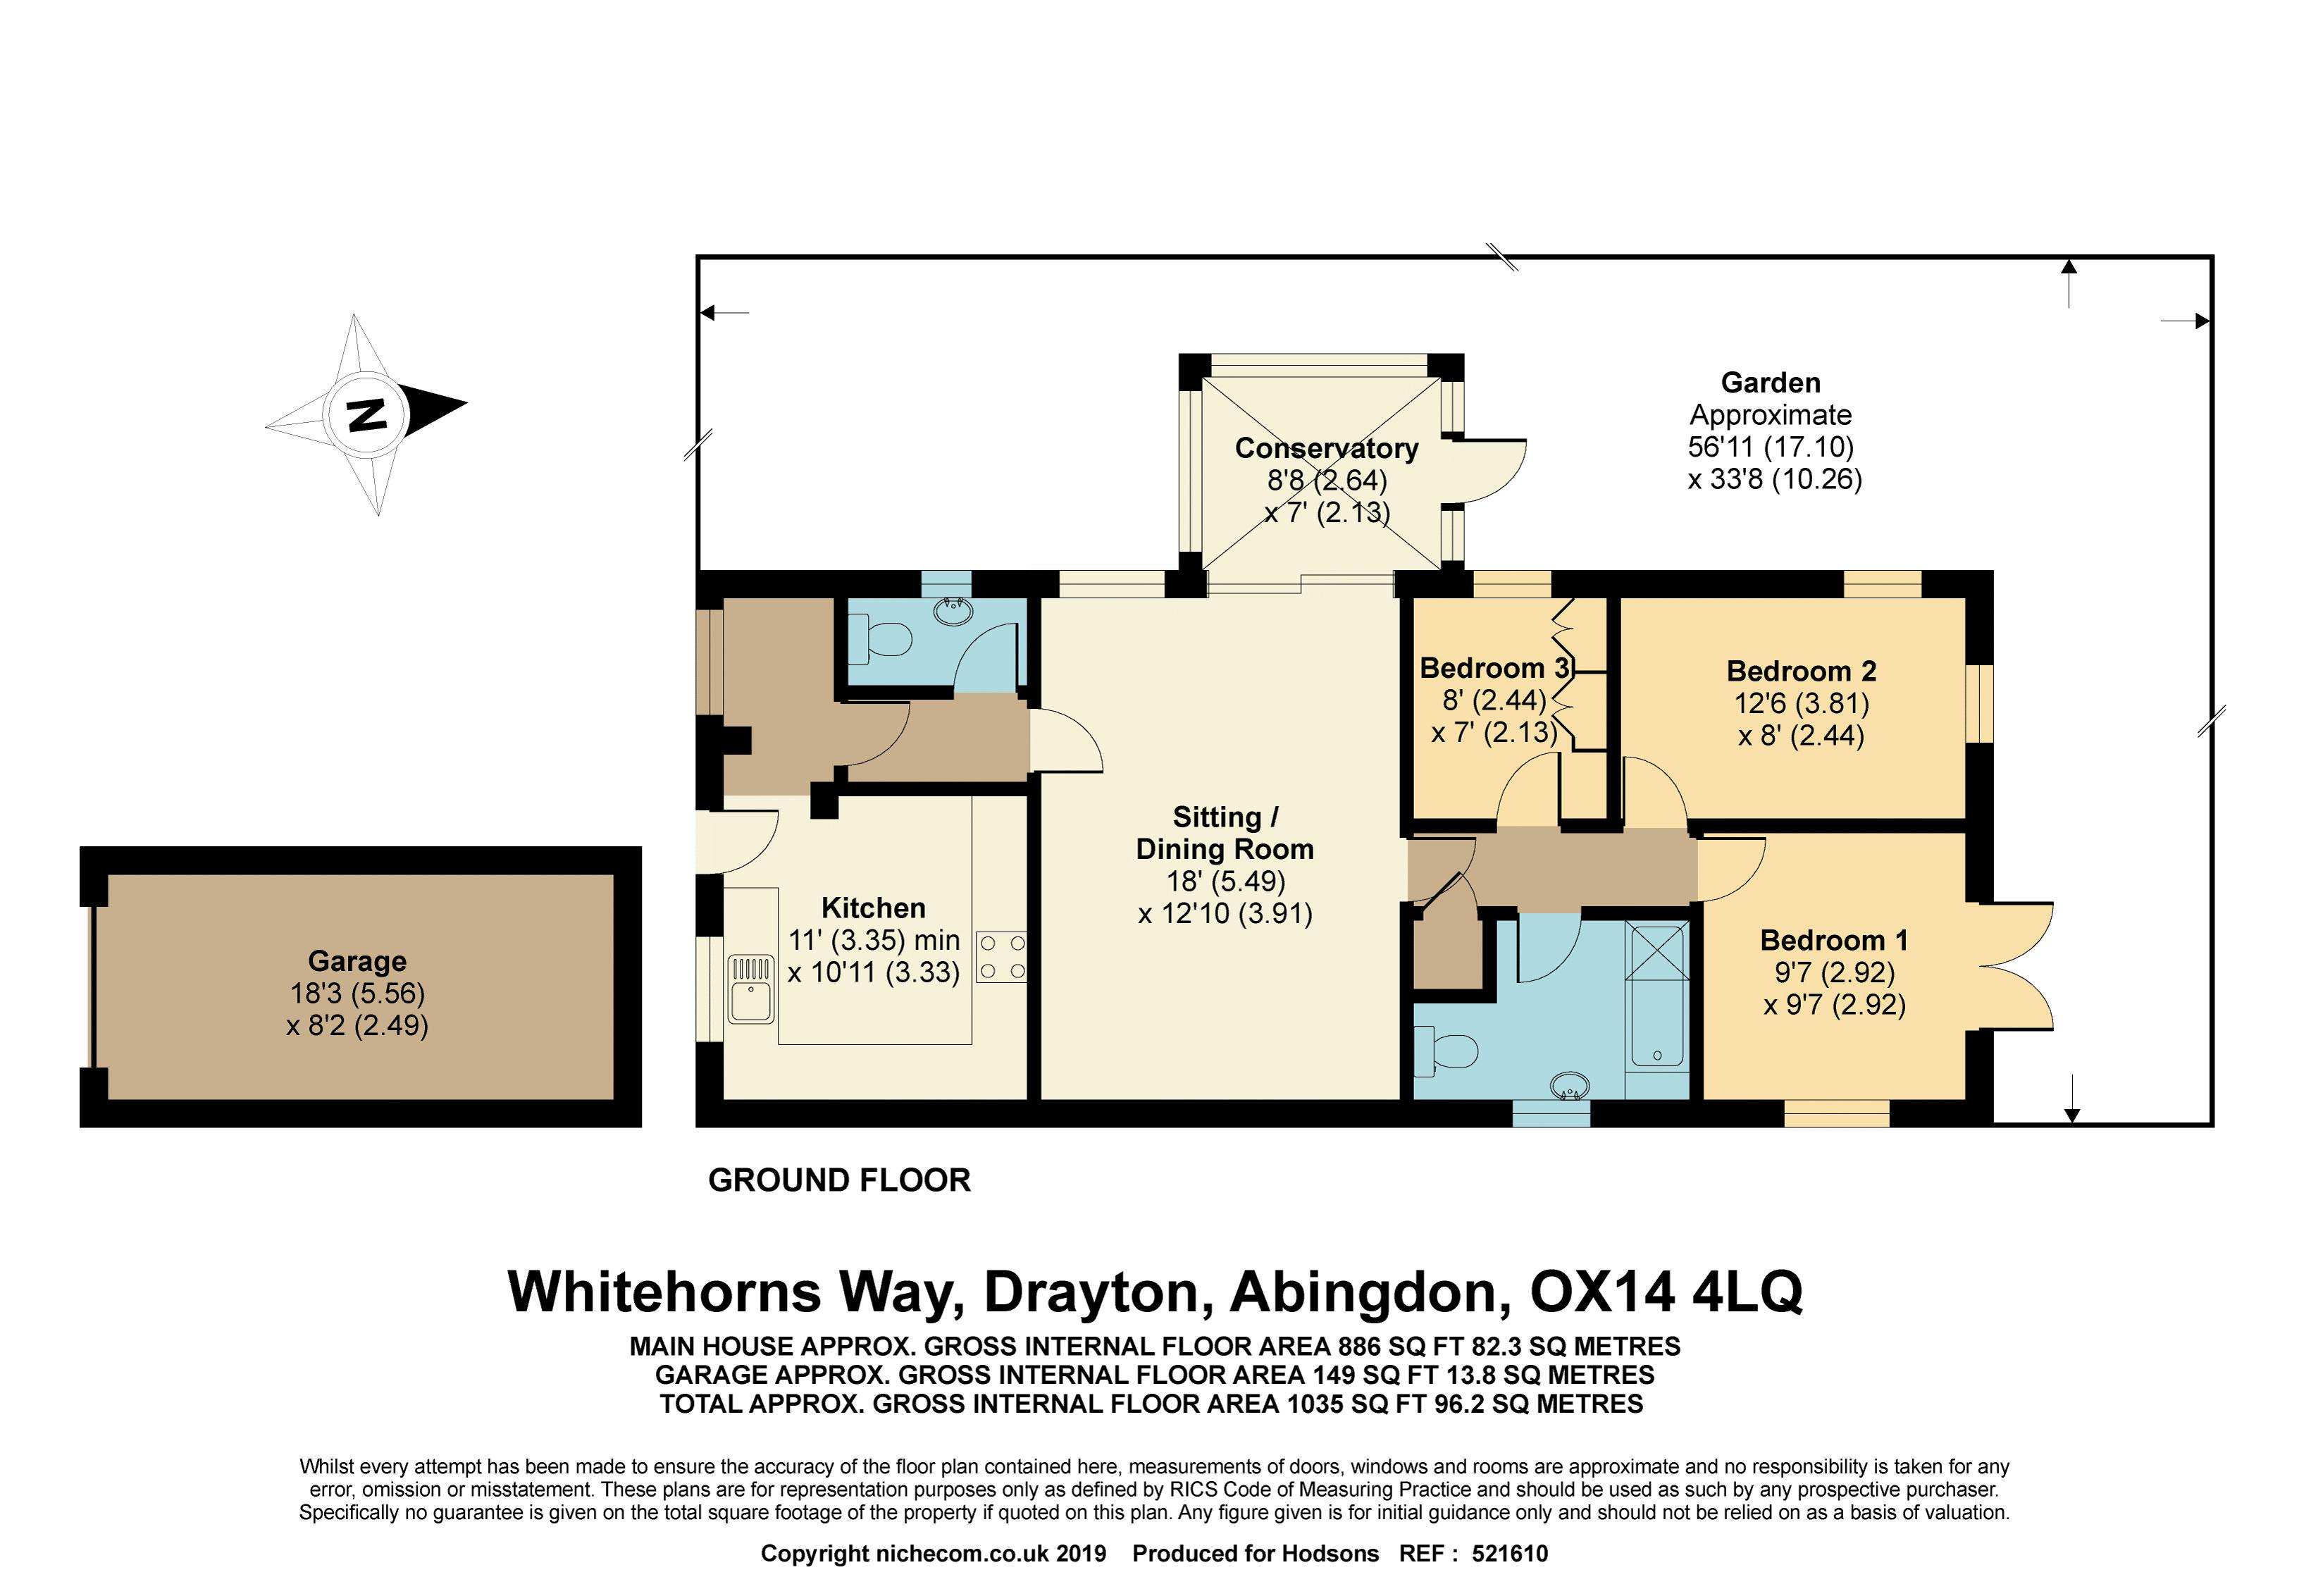 86 Whitehorns Way Drayton